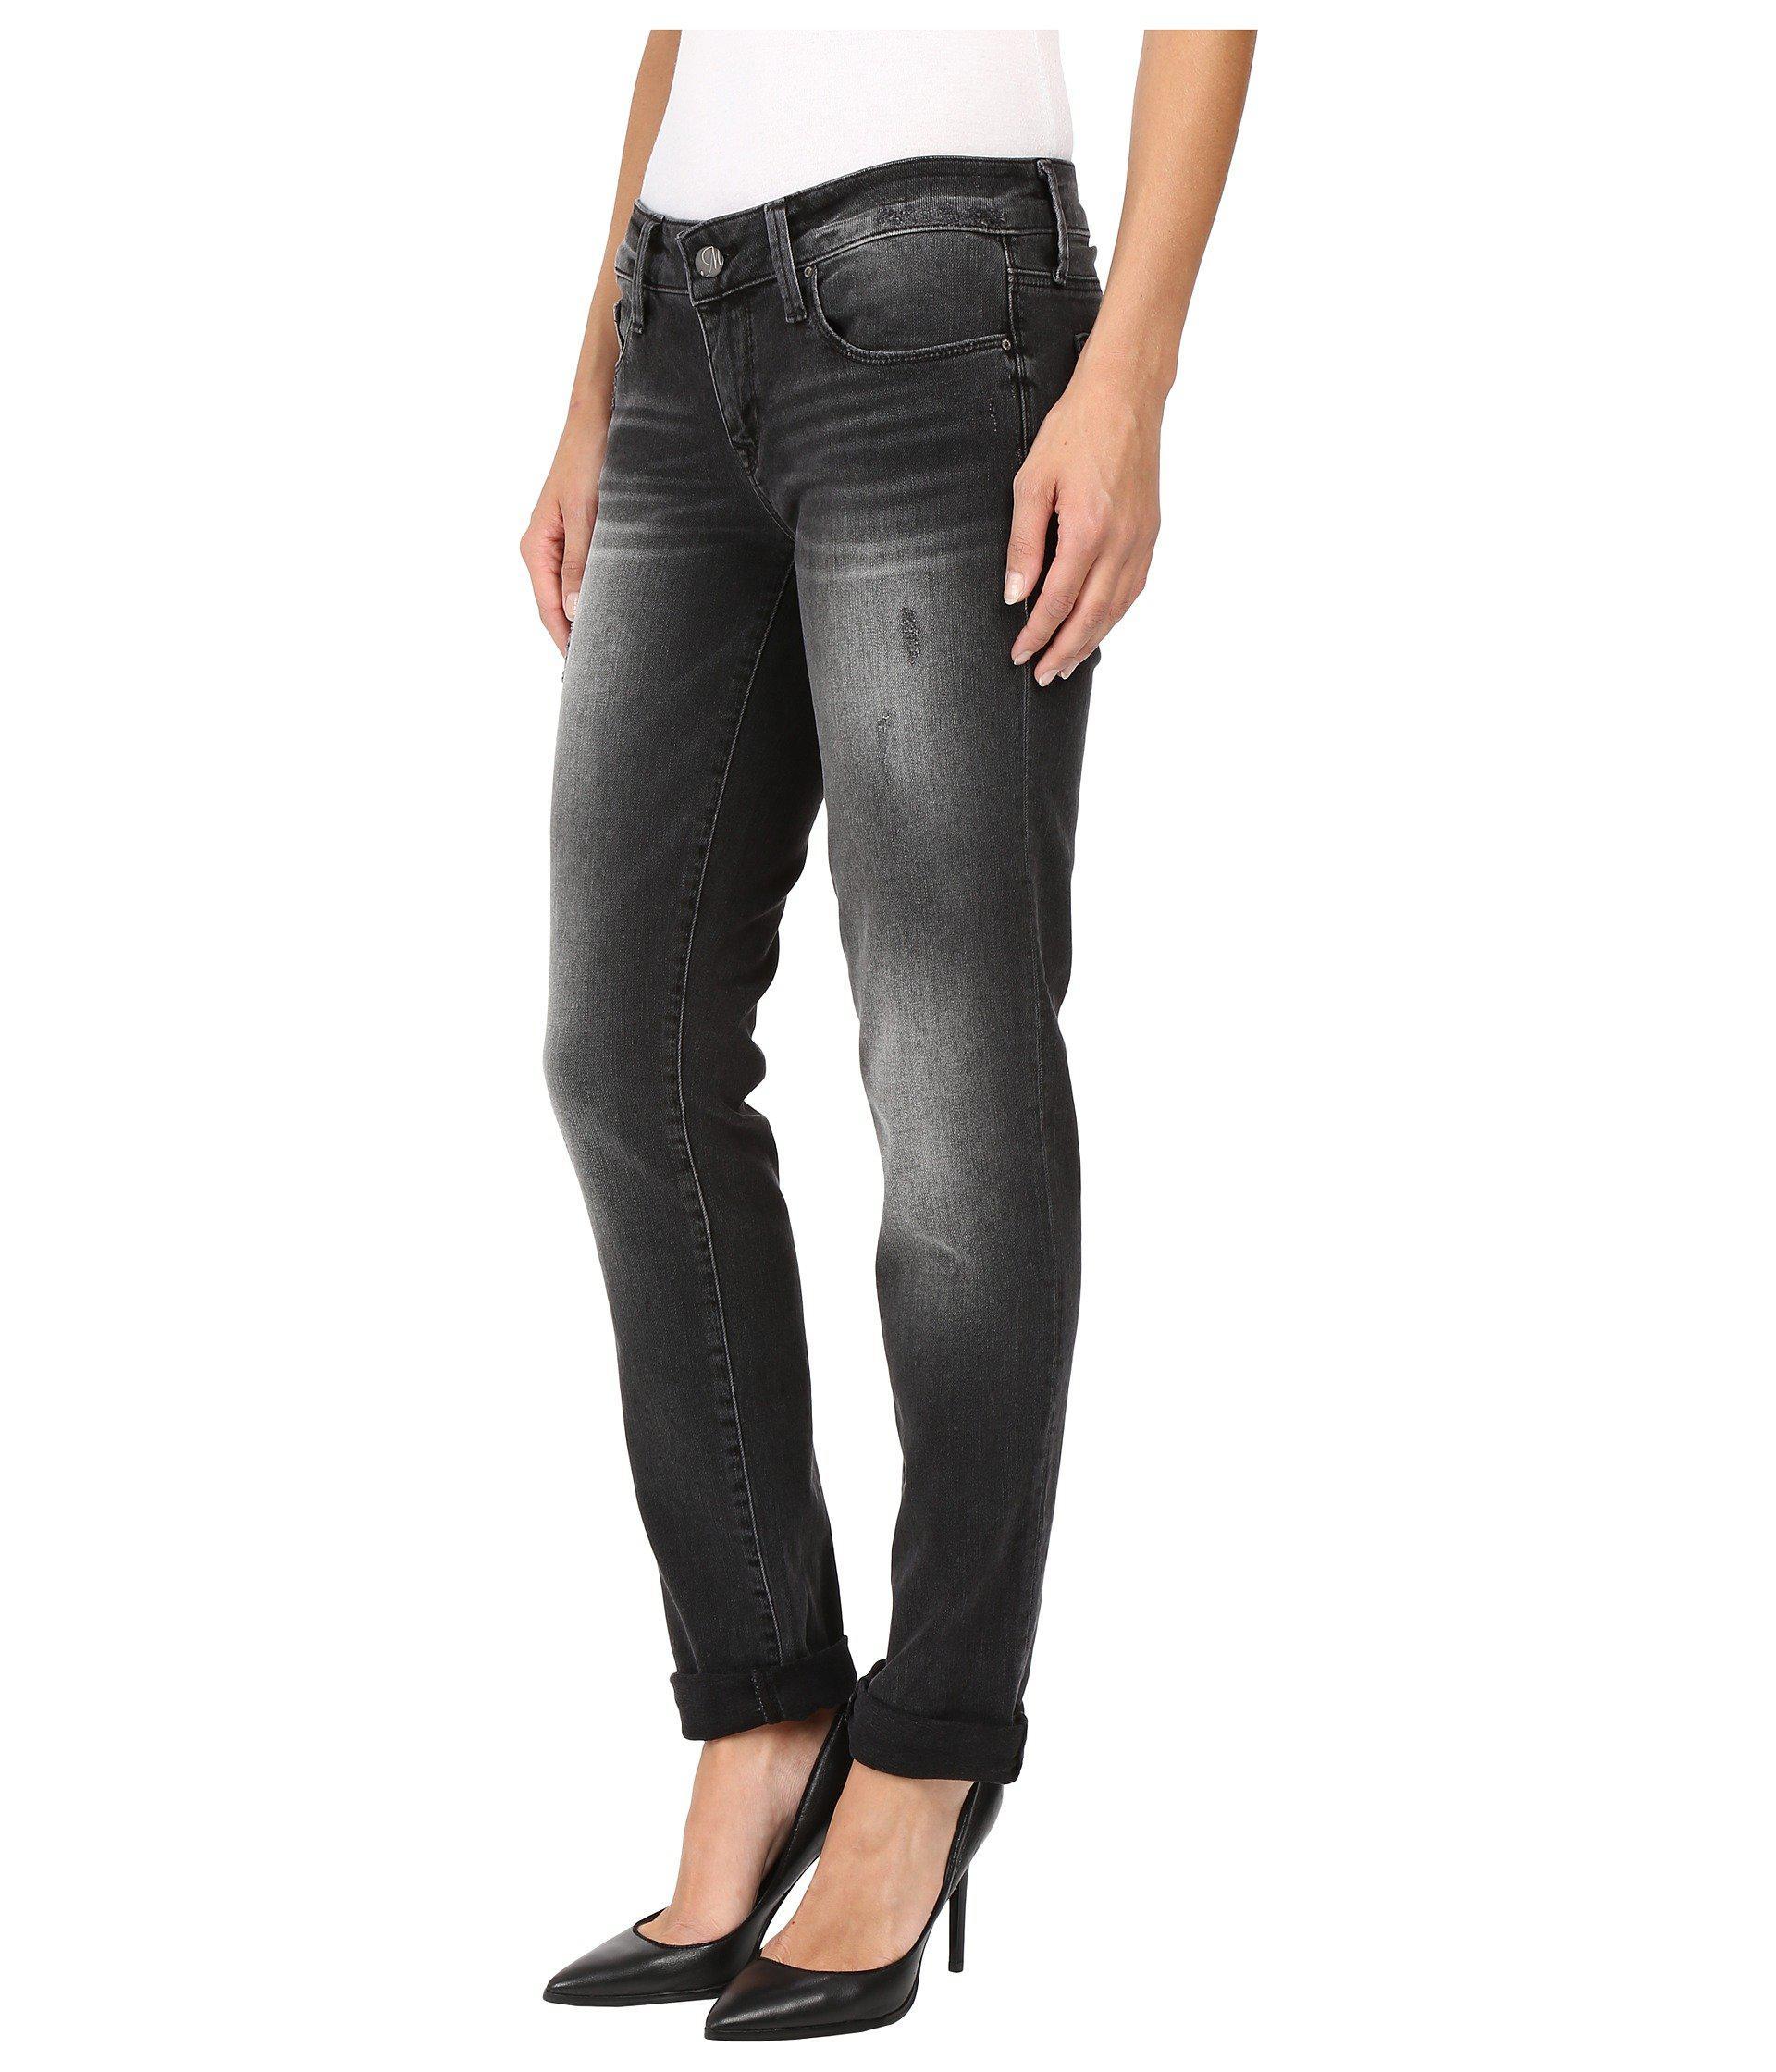 ef180d4621b Lyst - Mavi Jeans Emma Slim Boyfriend In Smoke Vintage - Save  71.08433734939759%